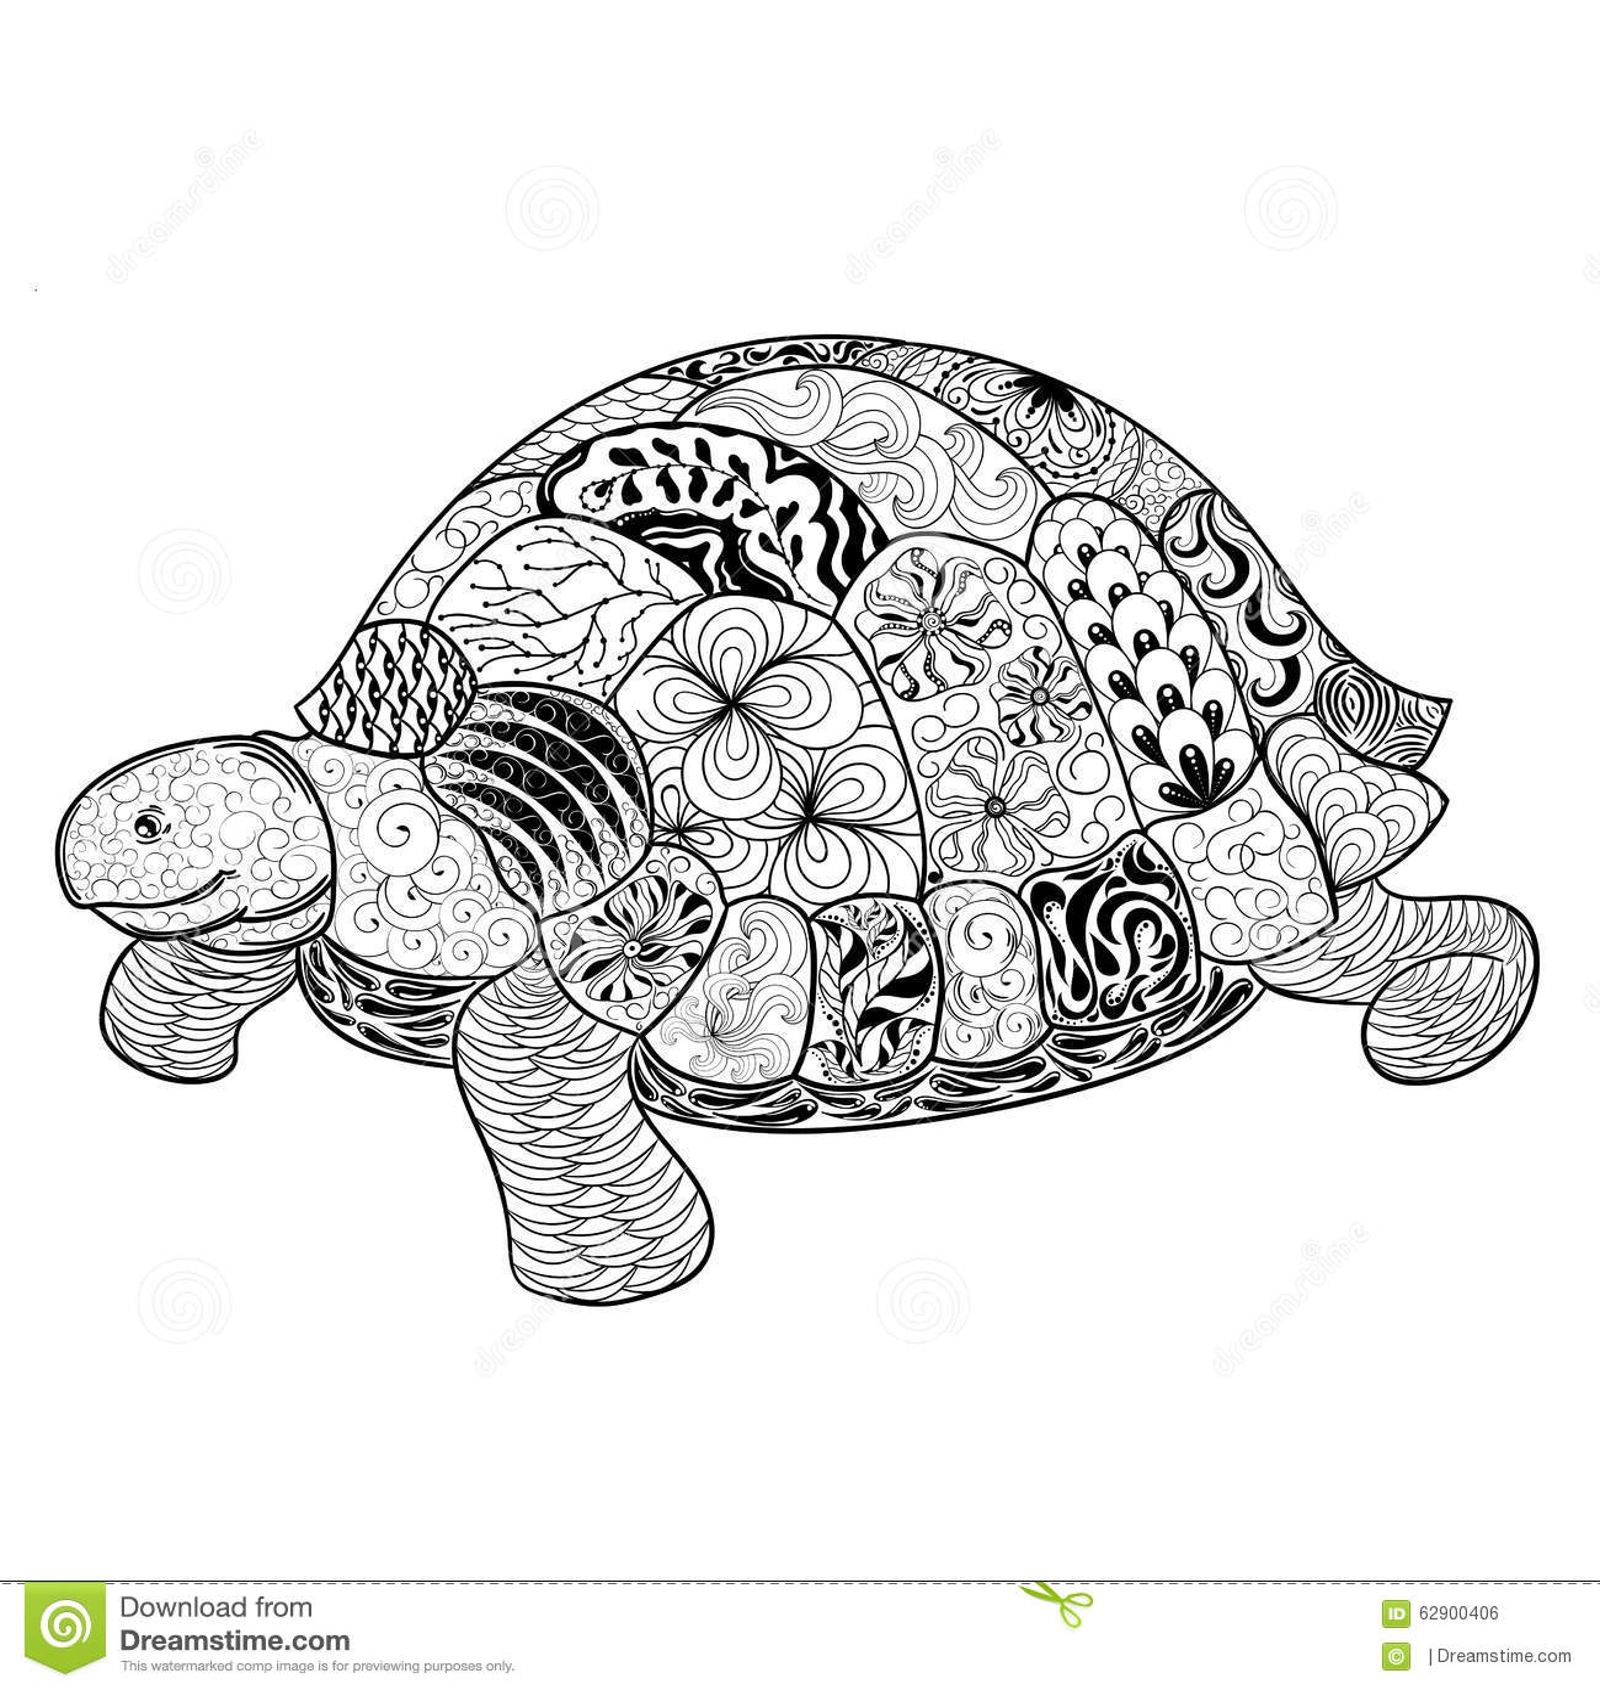 Turtle Doodle Illustration Stock Vector Illustration Of